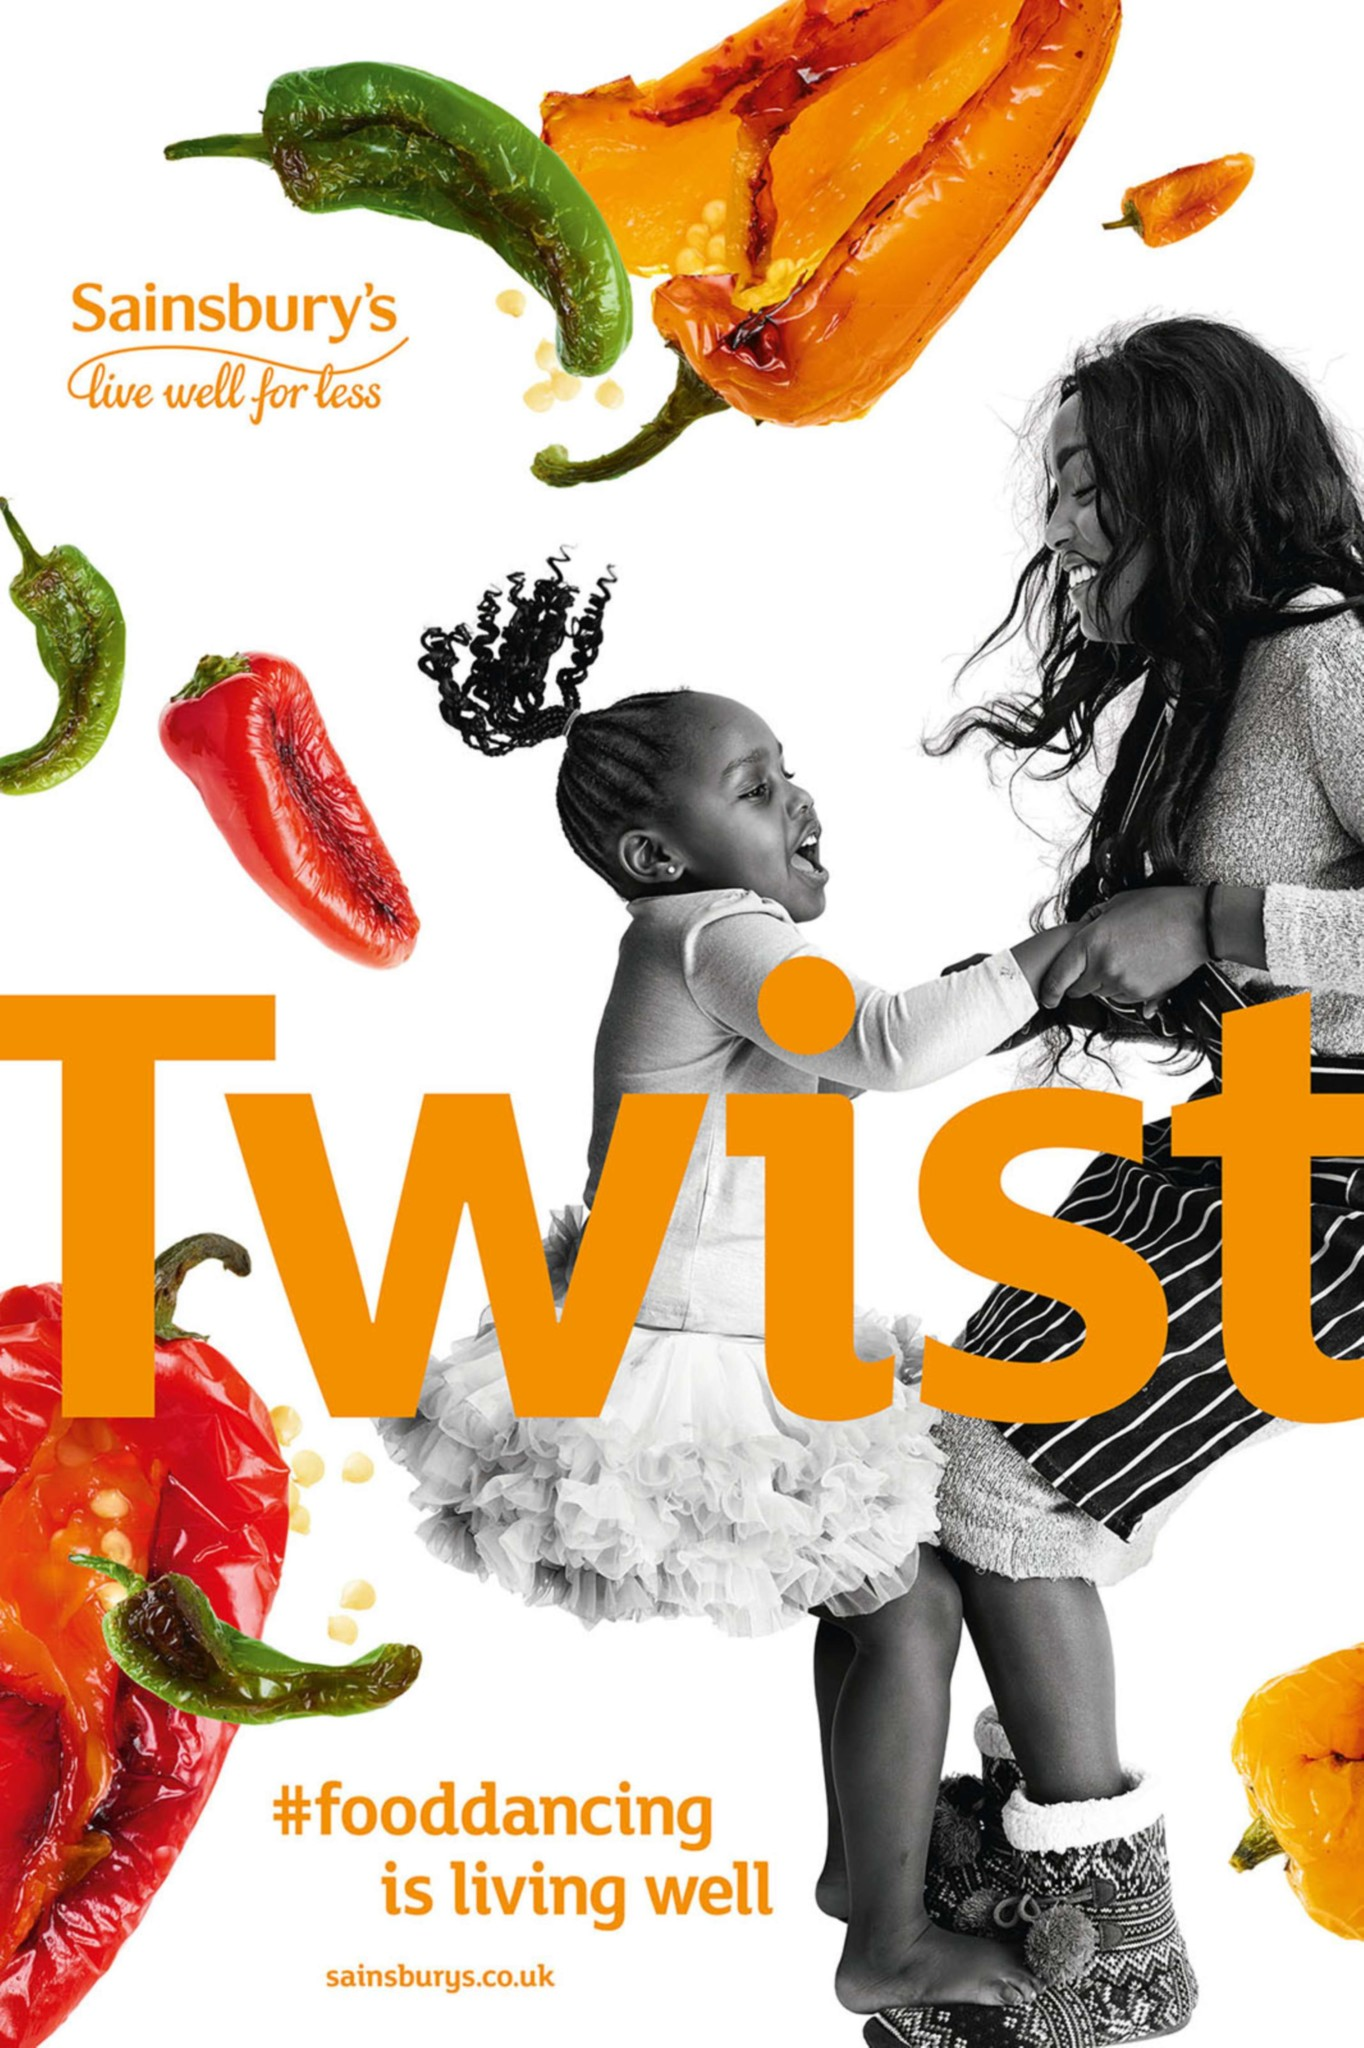 sai01p16013-fooddancing-print-twist-portrait-master-v01